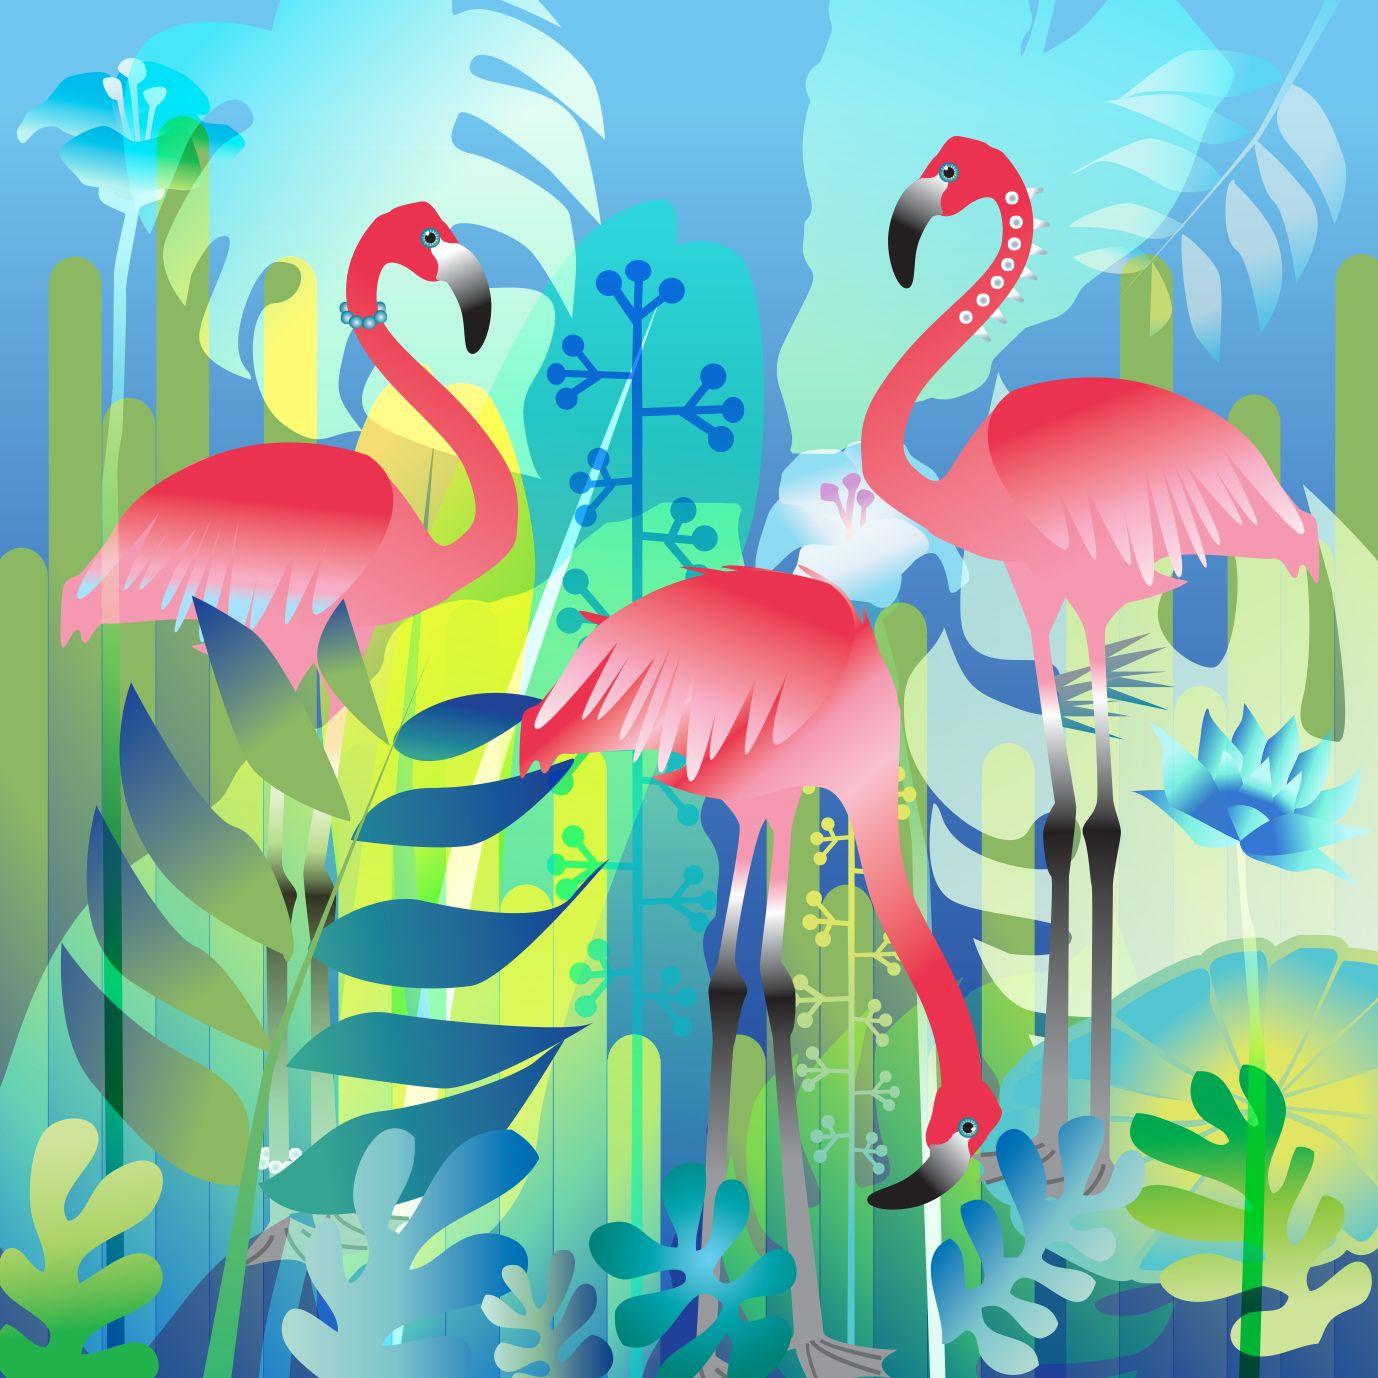 Pink Flamingo Canvas Art For Kids Kids Room Wall Art Nursery Print Canvas Print Nursery Decor Kids Room Poste Flamingo Art Printable Art Kids Room Poster